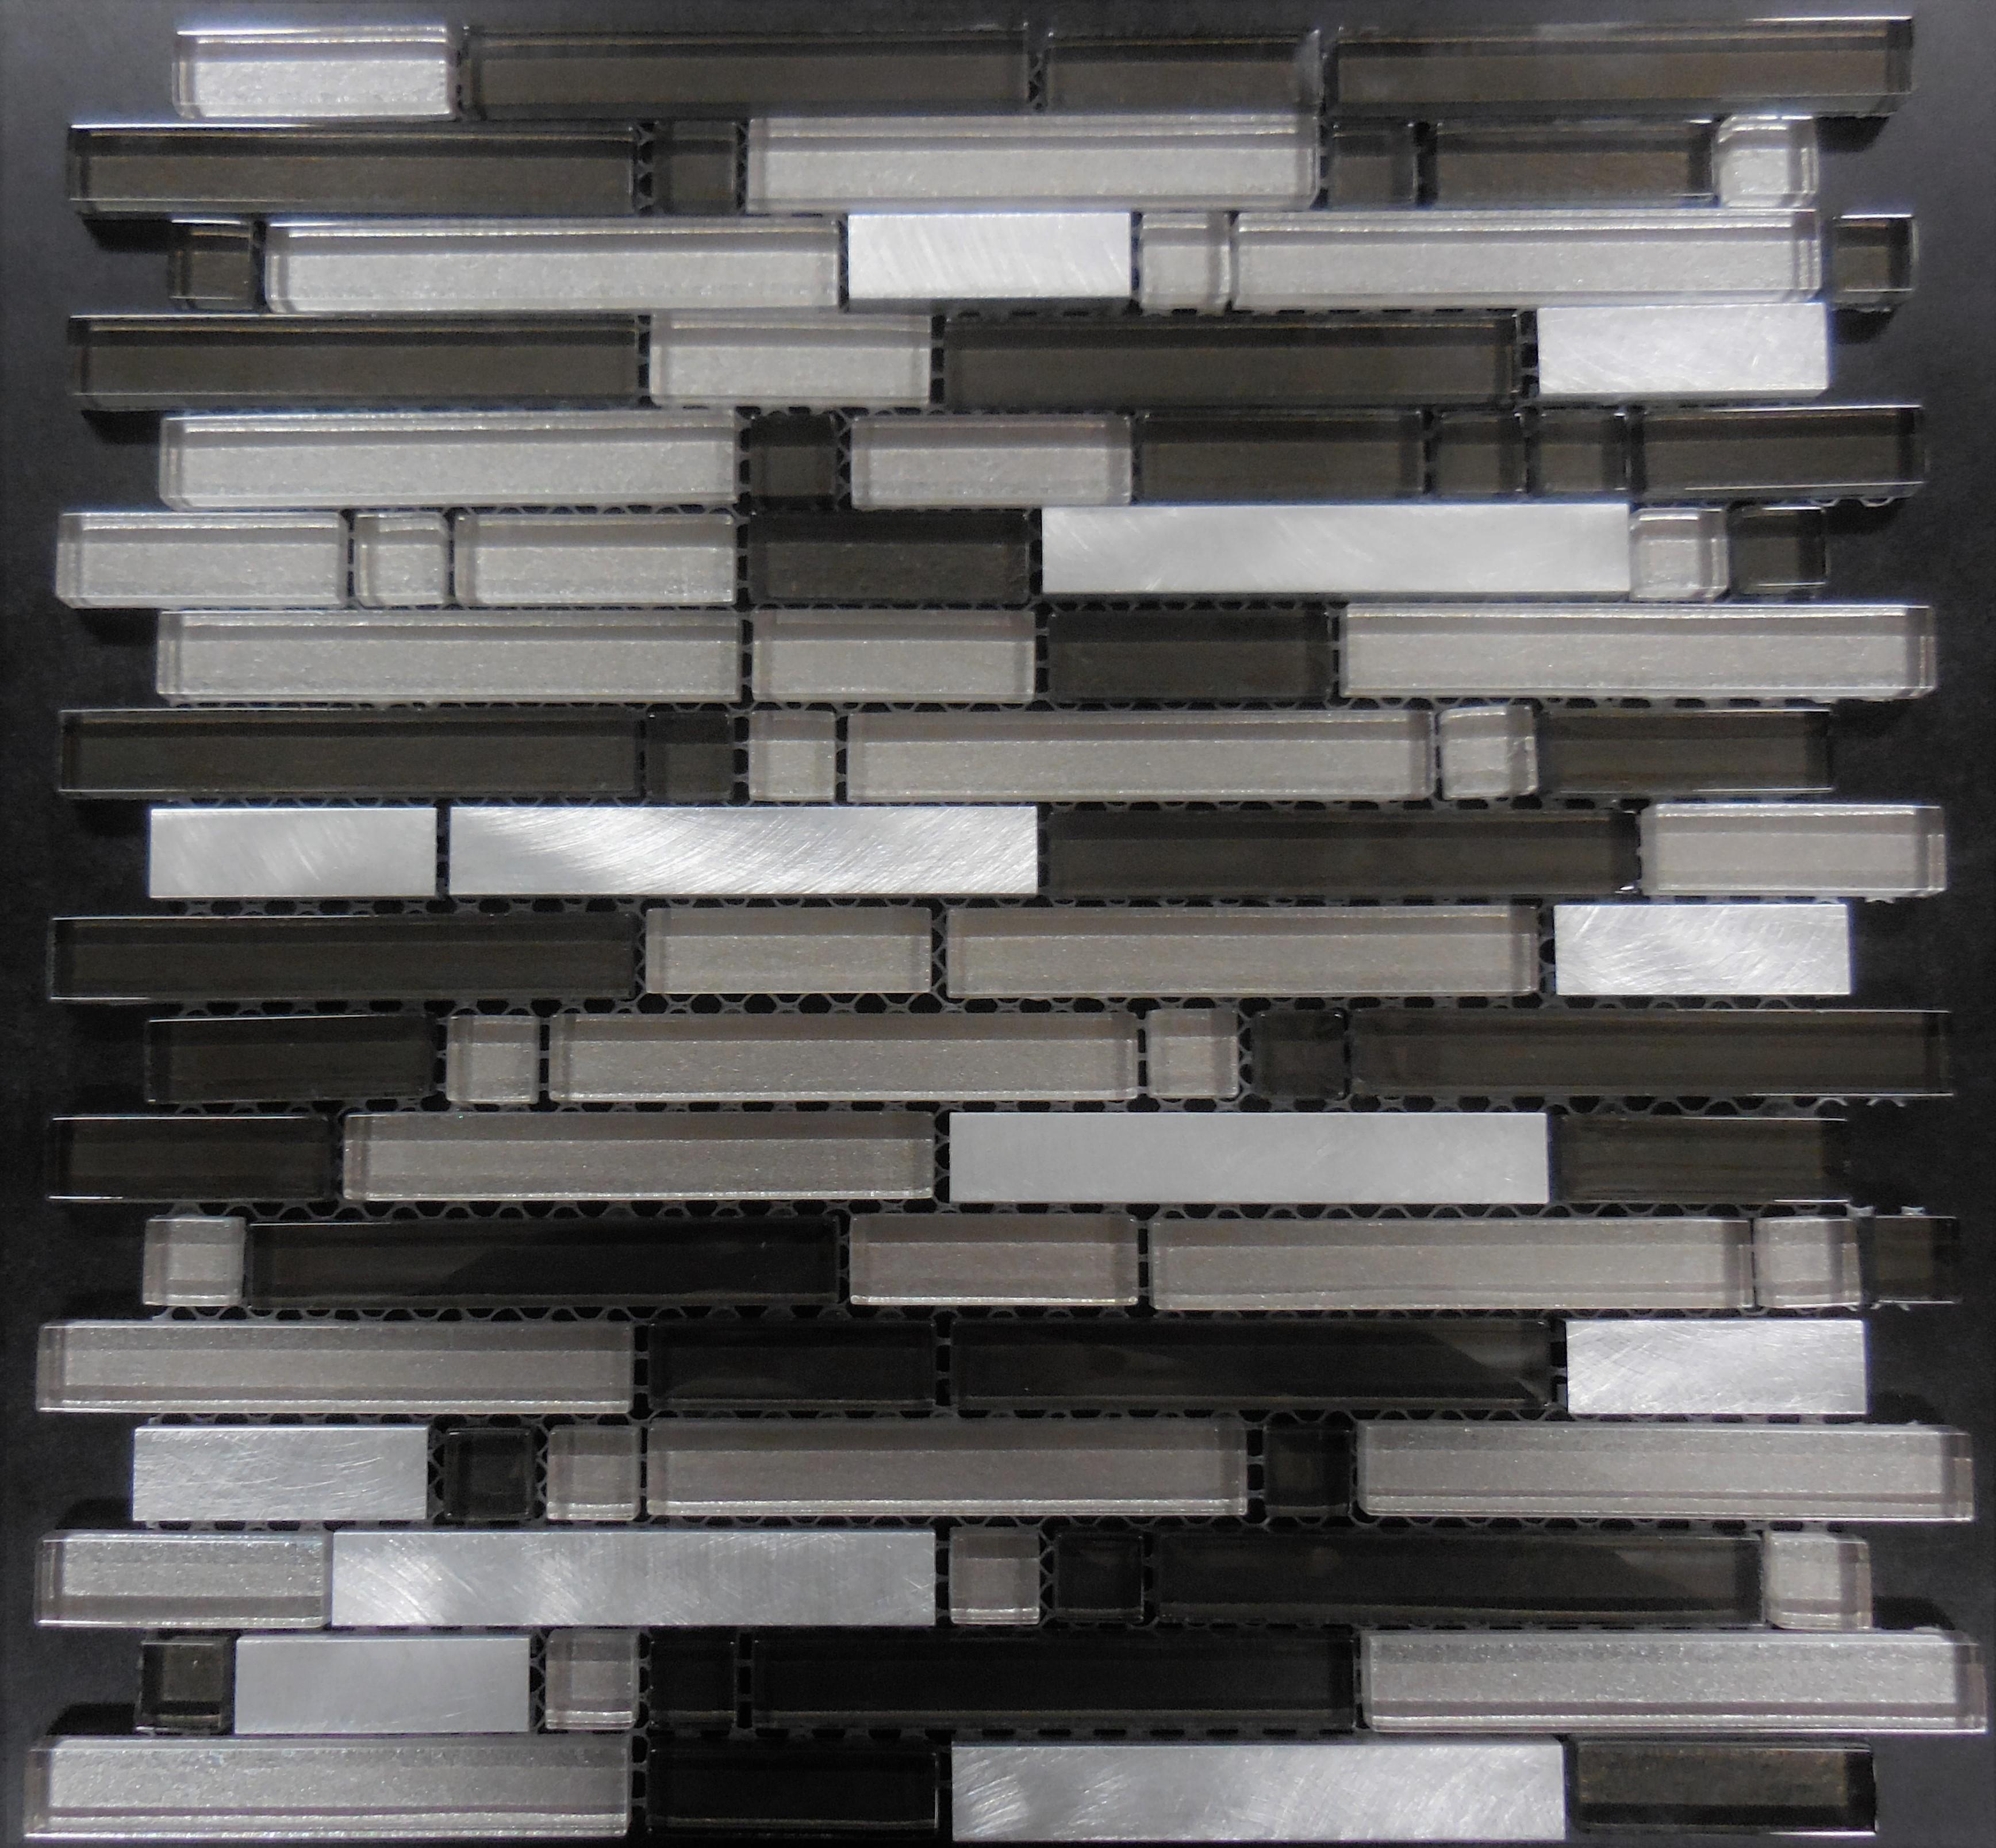 al775 stone brick series random brick glass and stone glass tile